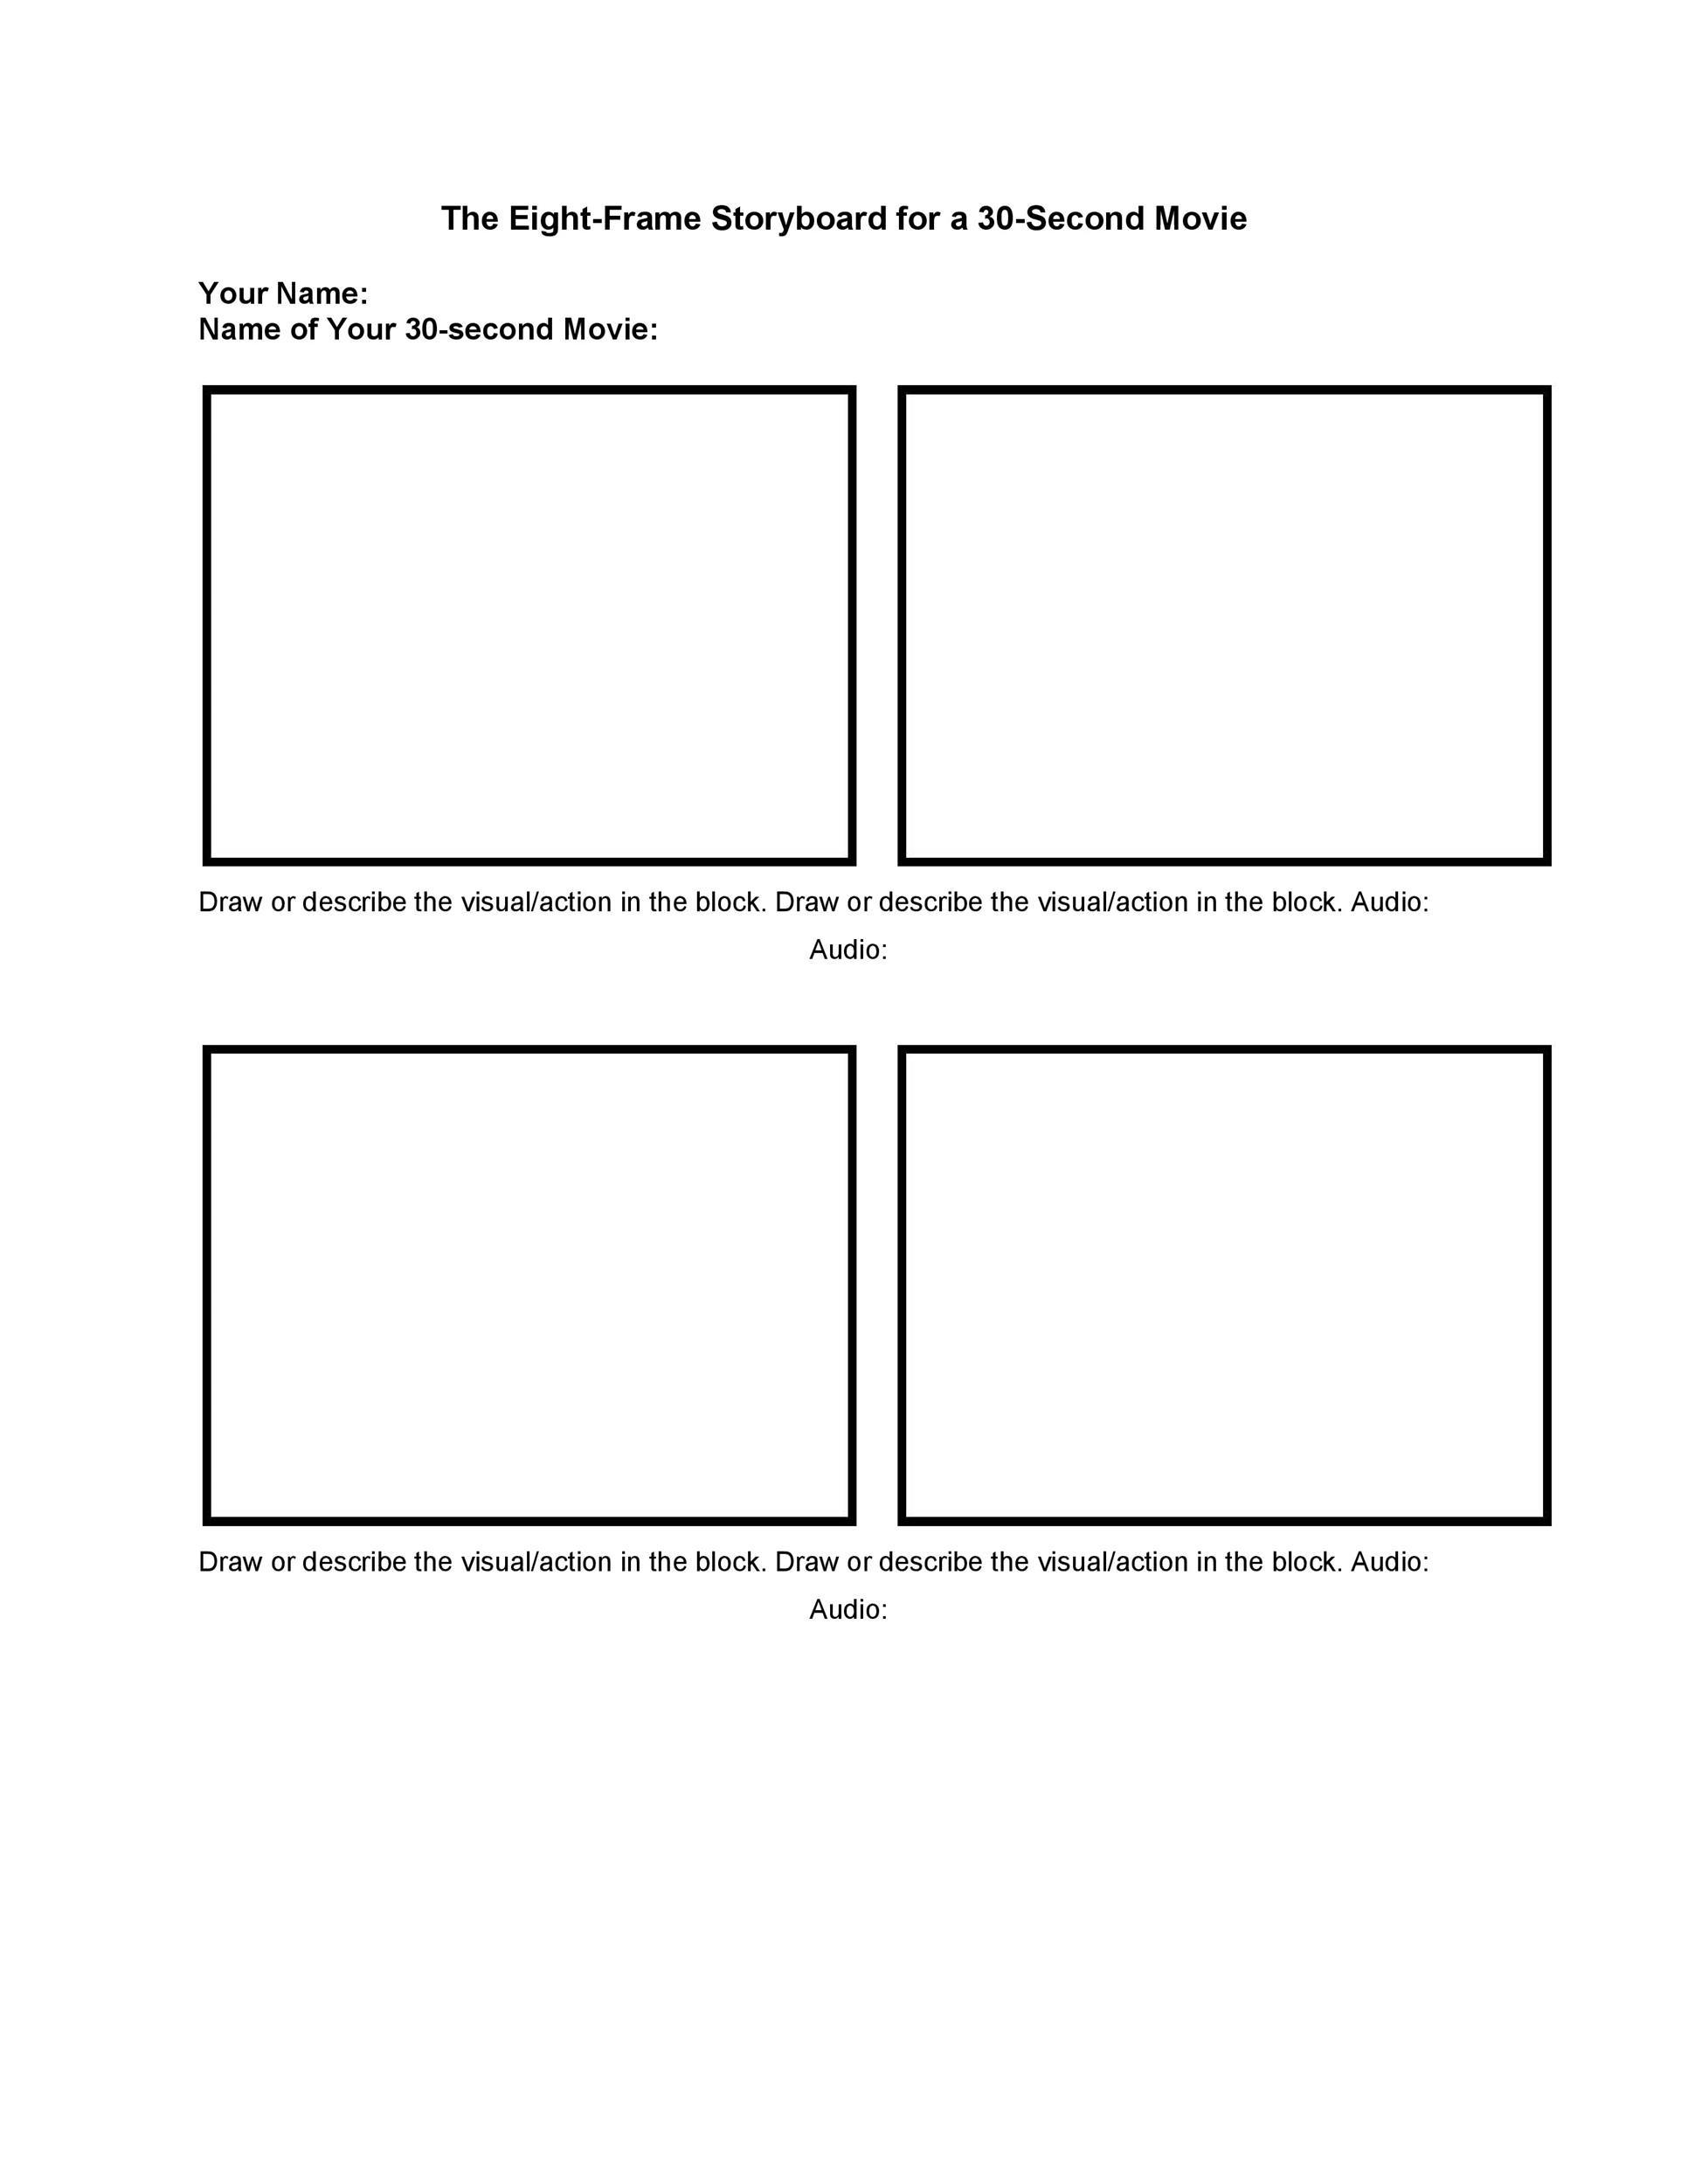 40 Professional Storyboard Templates \ Examples - visual storyboards